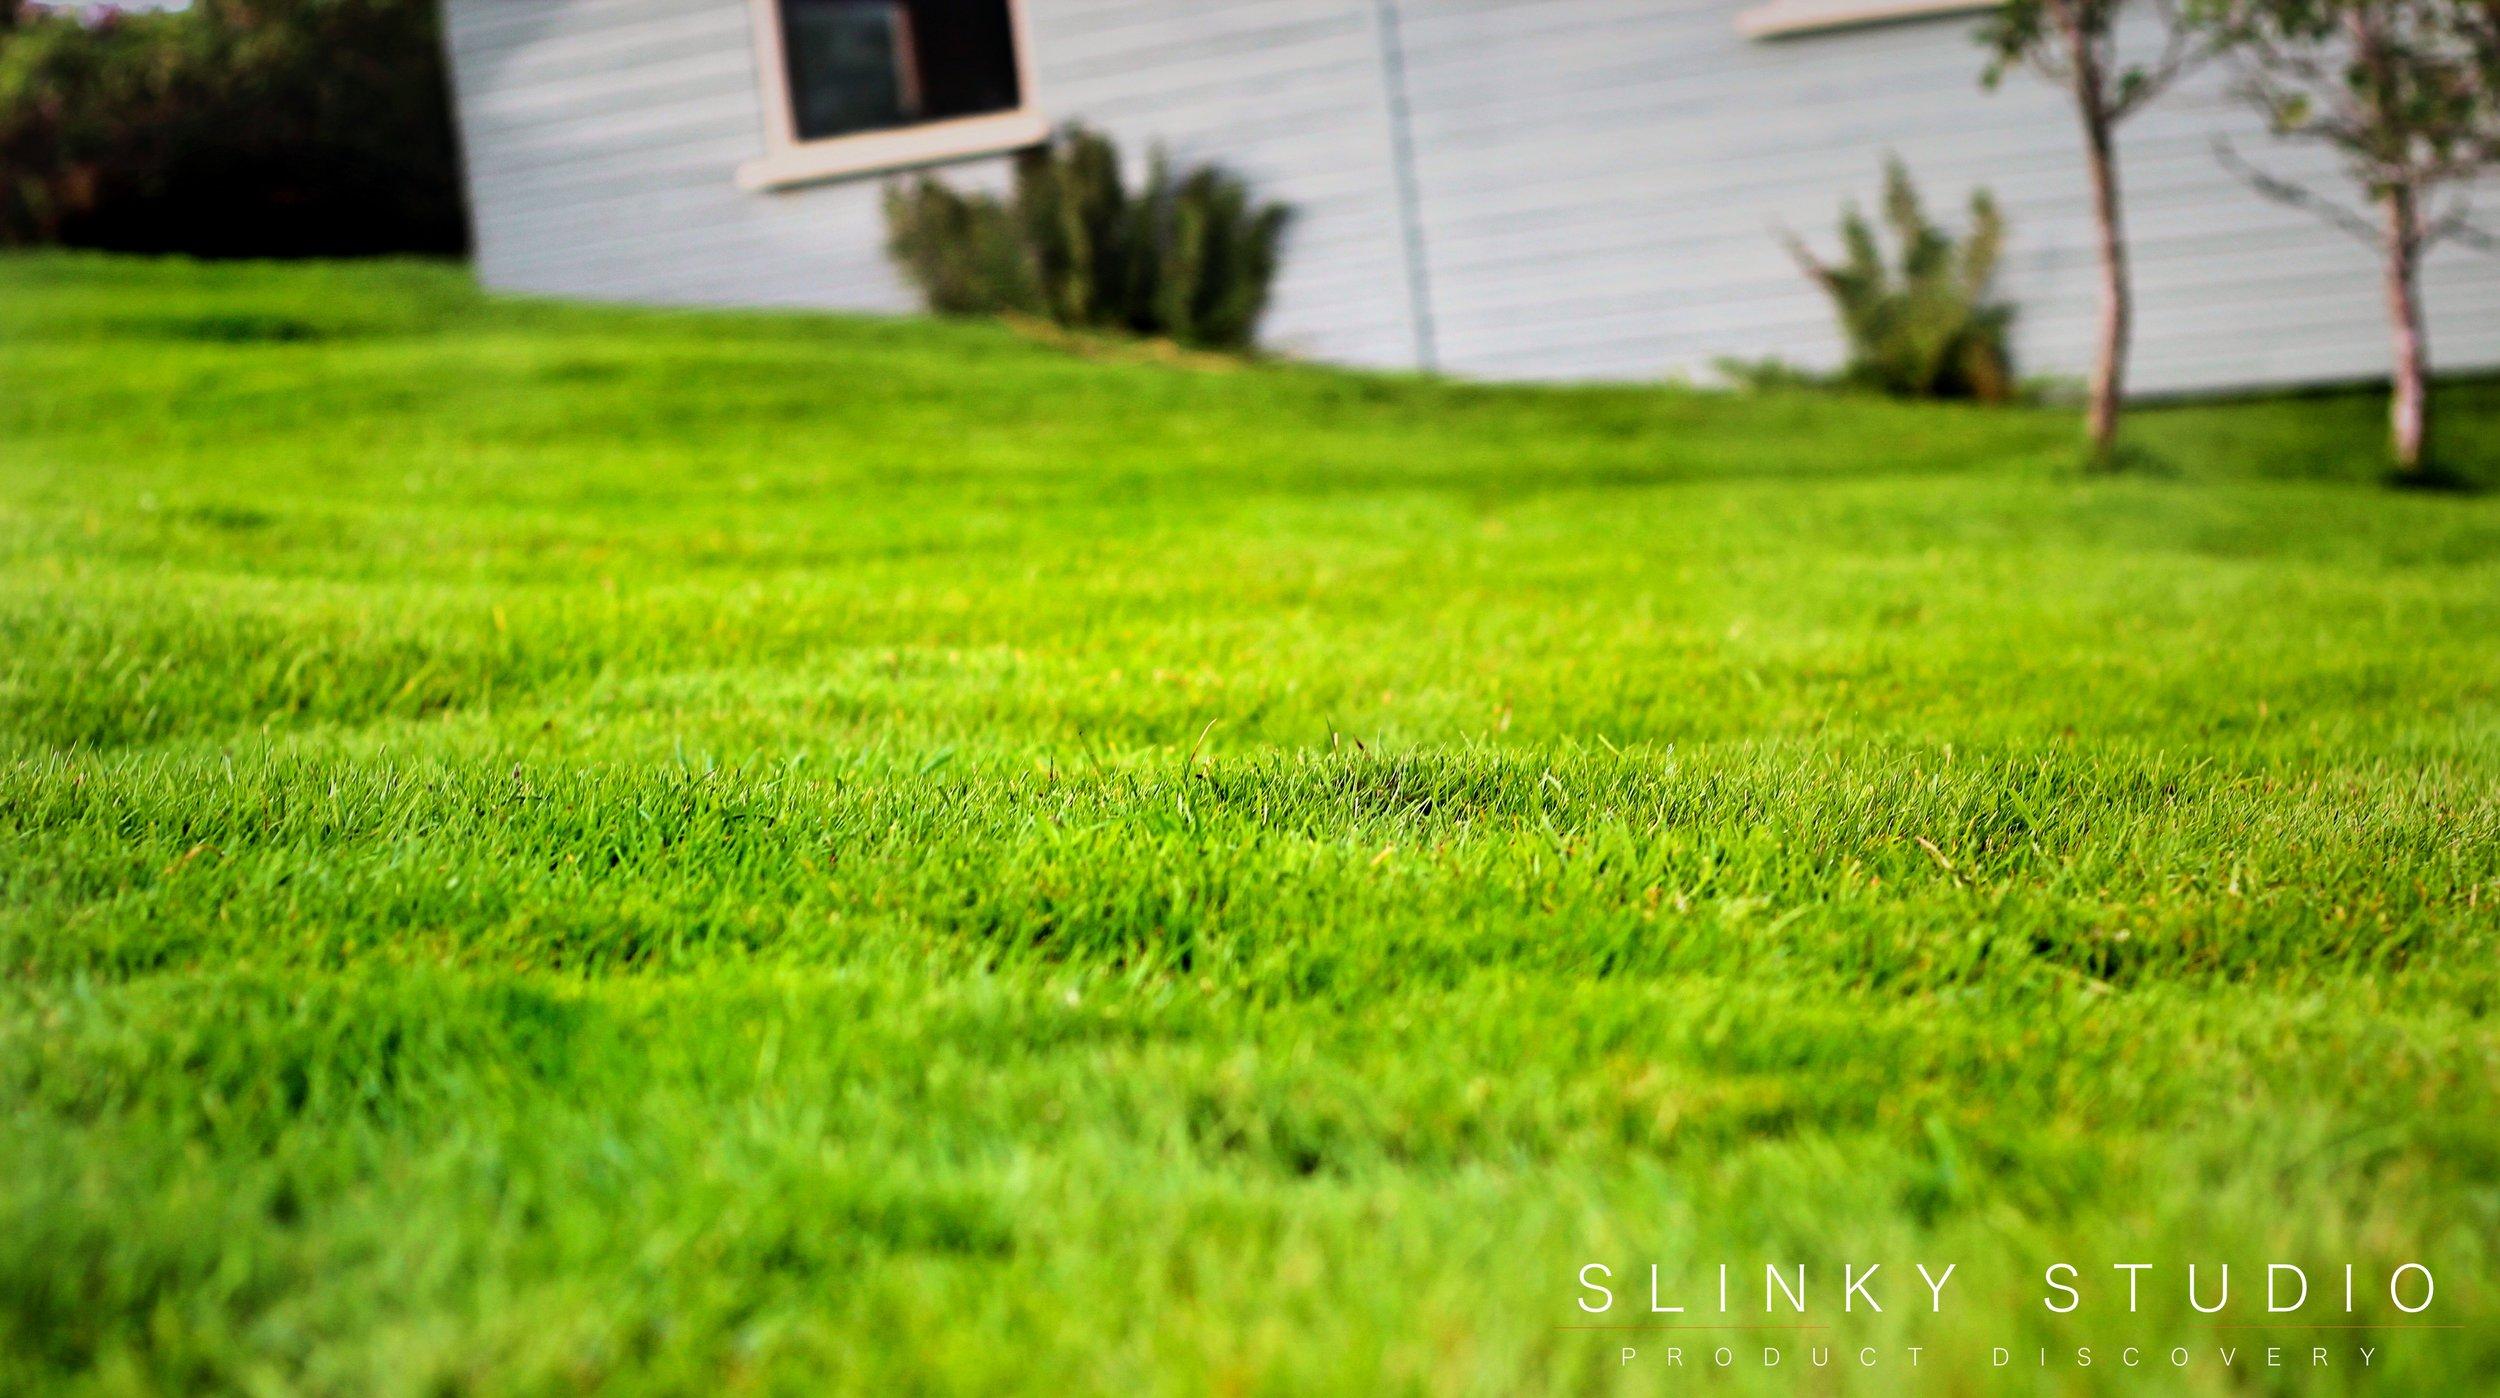 Bosch Rotak 43 LI Ergoflex Cordless Lawnmower Slopey Lawn Grass Cut.jpg